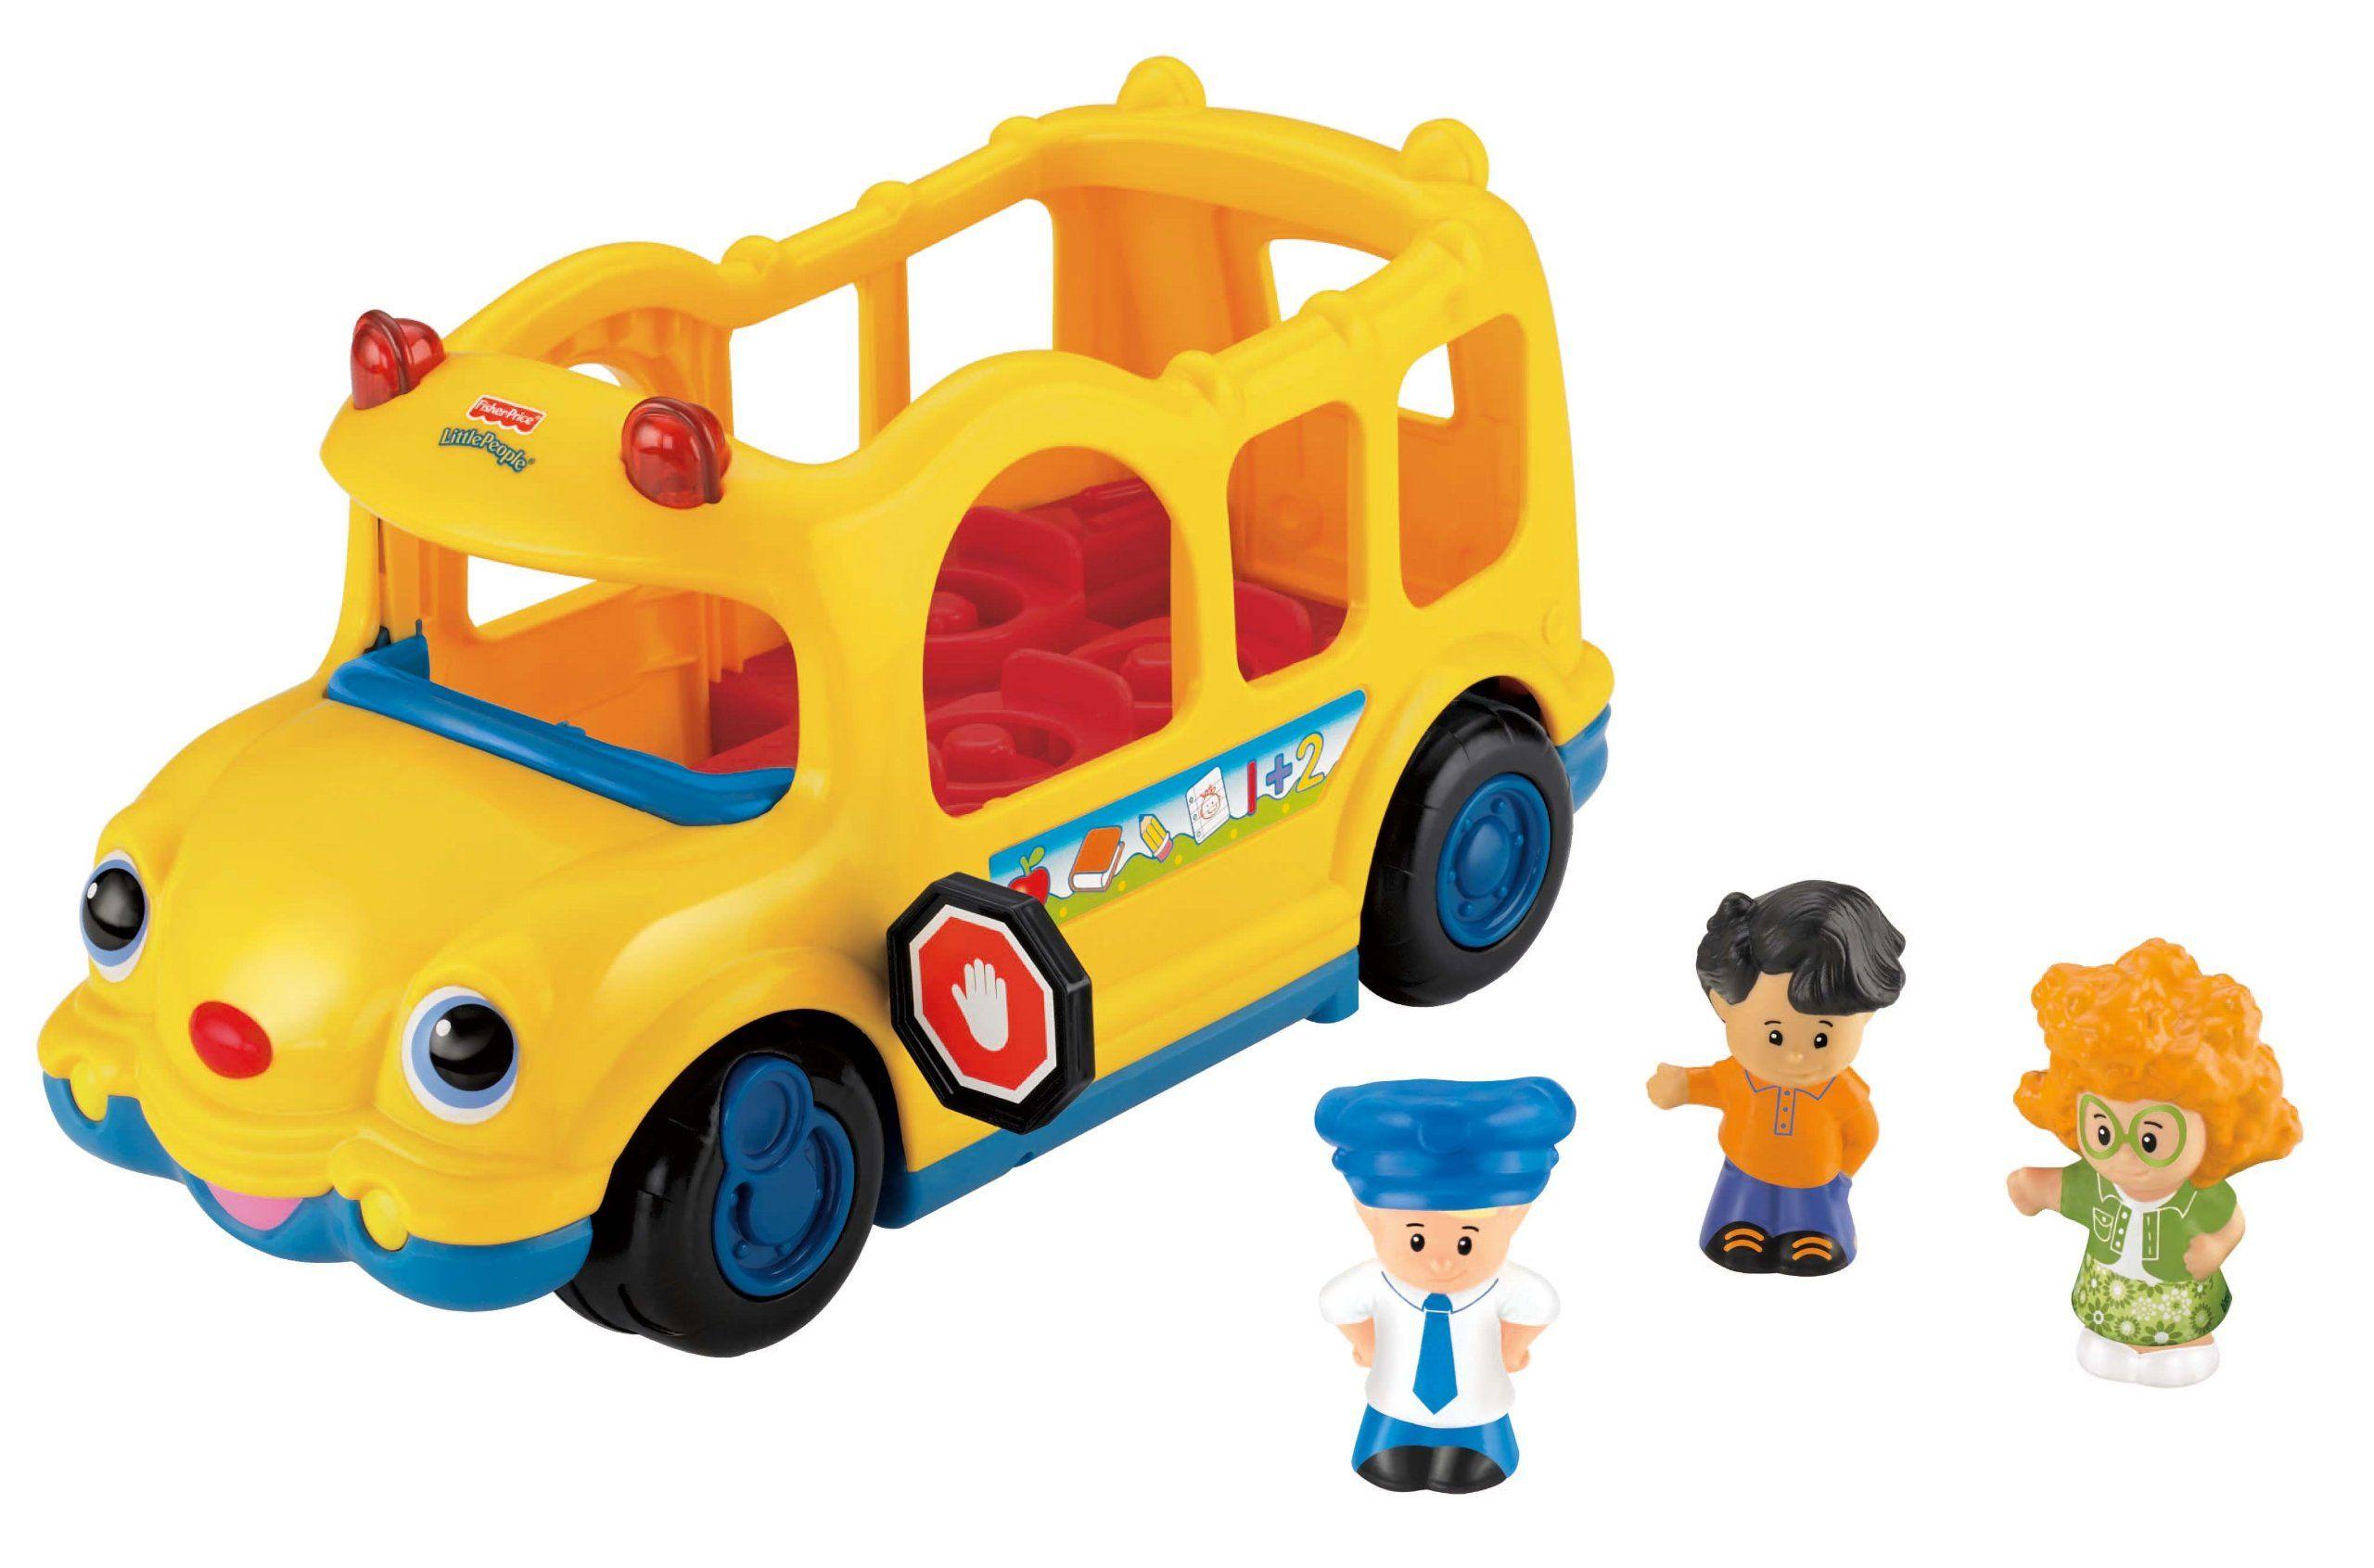 Little people car toys  FisherPrice Little People Lilu Movers School Bus  Baby Ideas